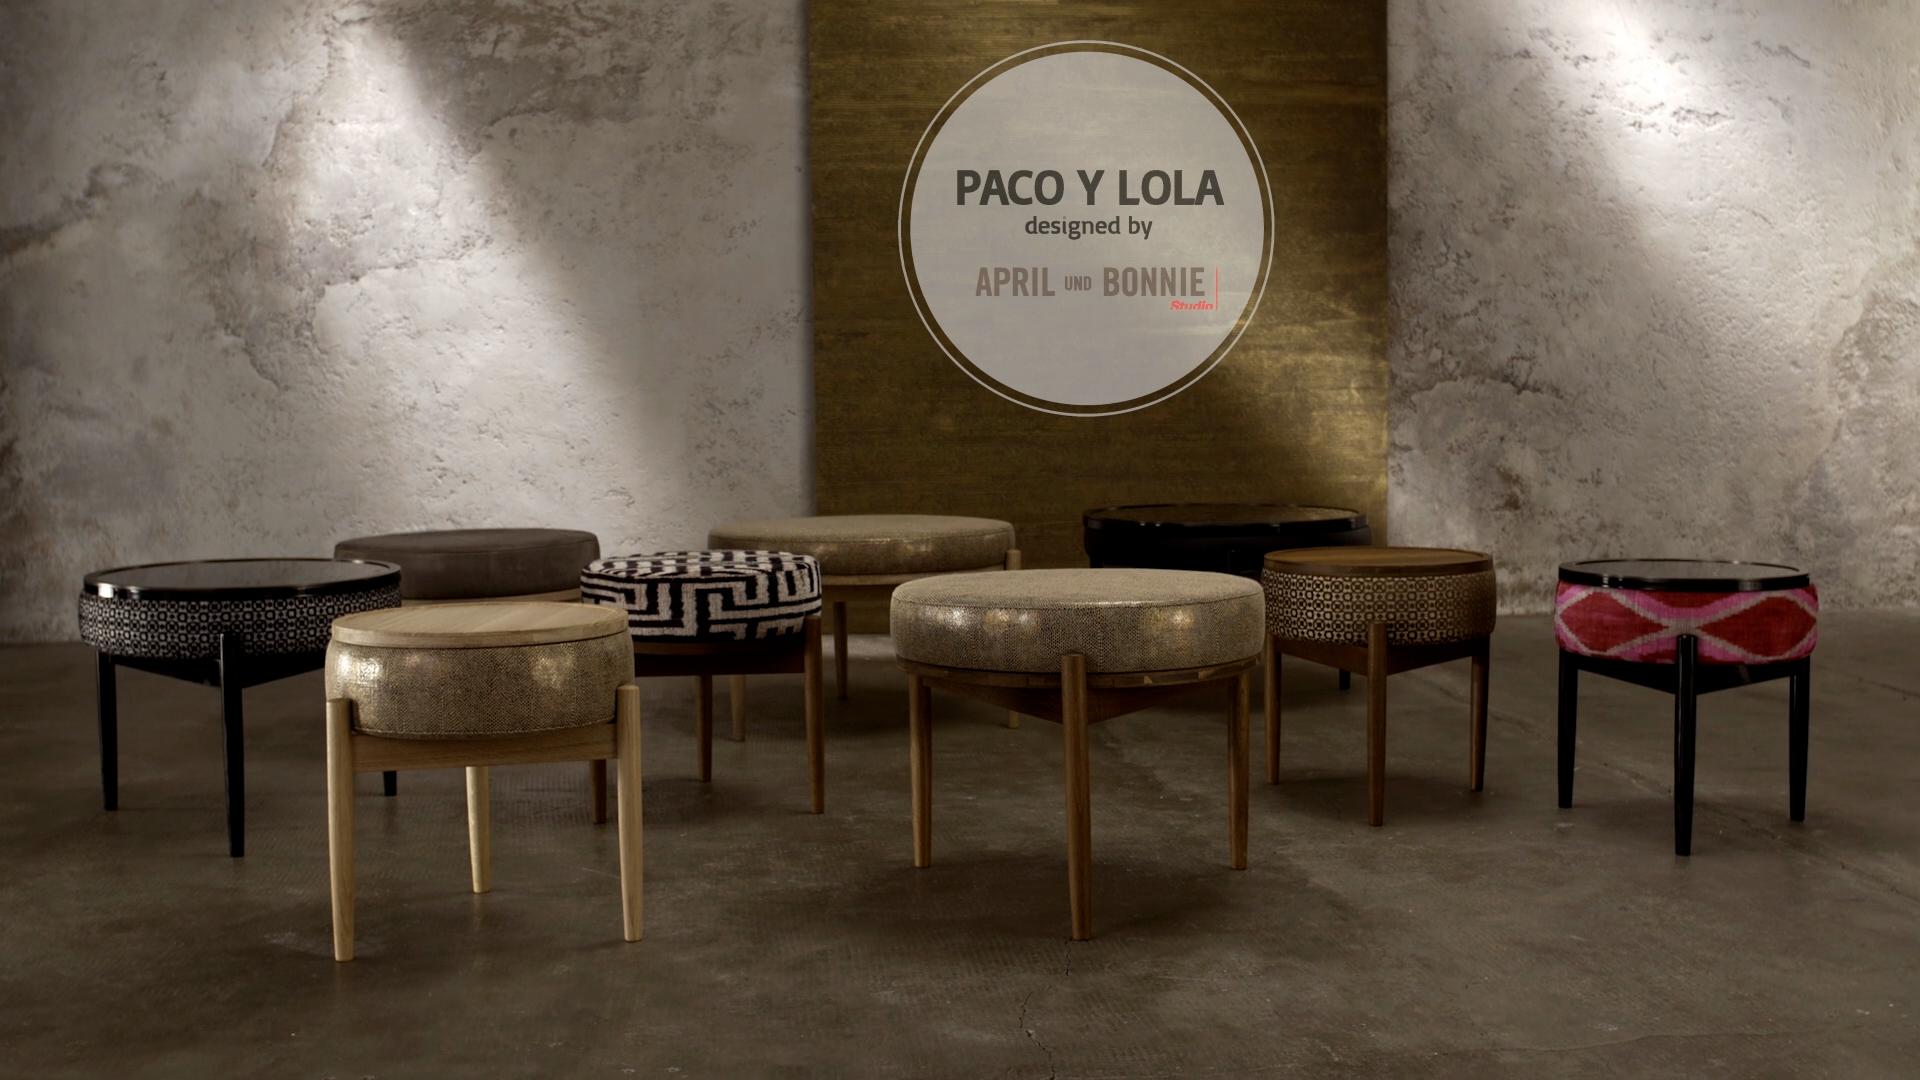 PACO Y LOLA Commercial